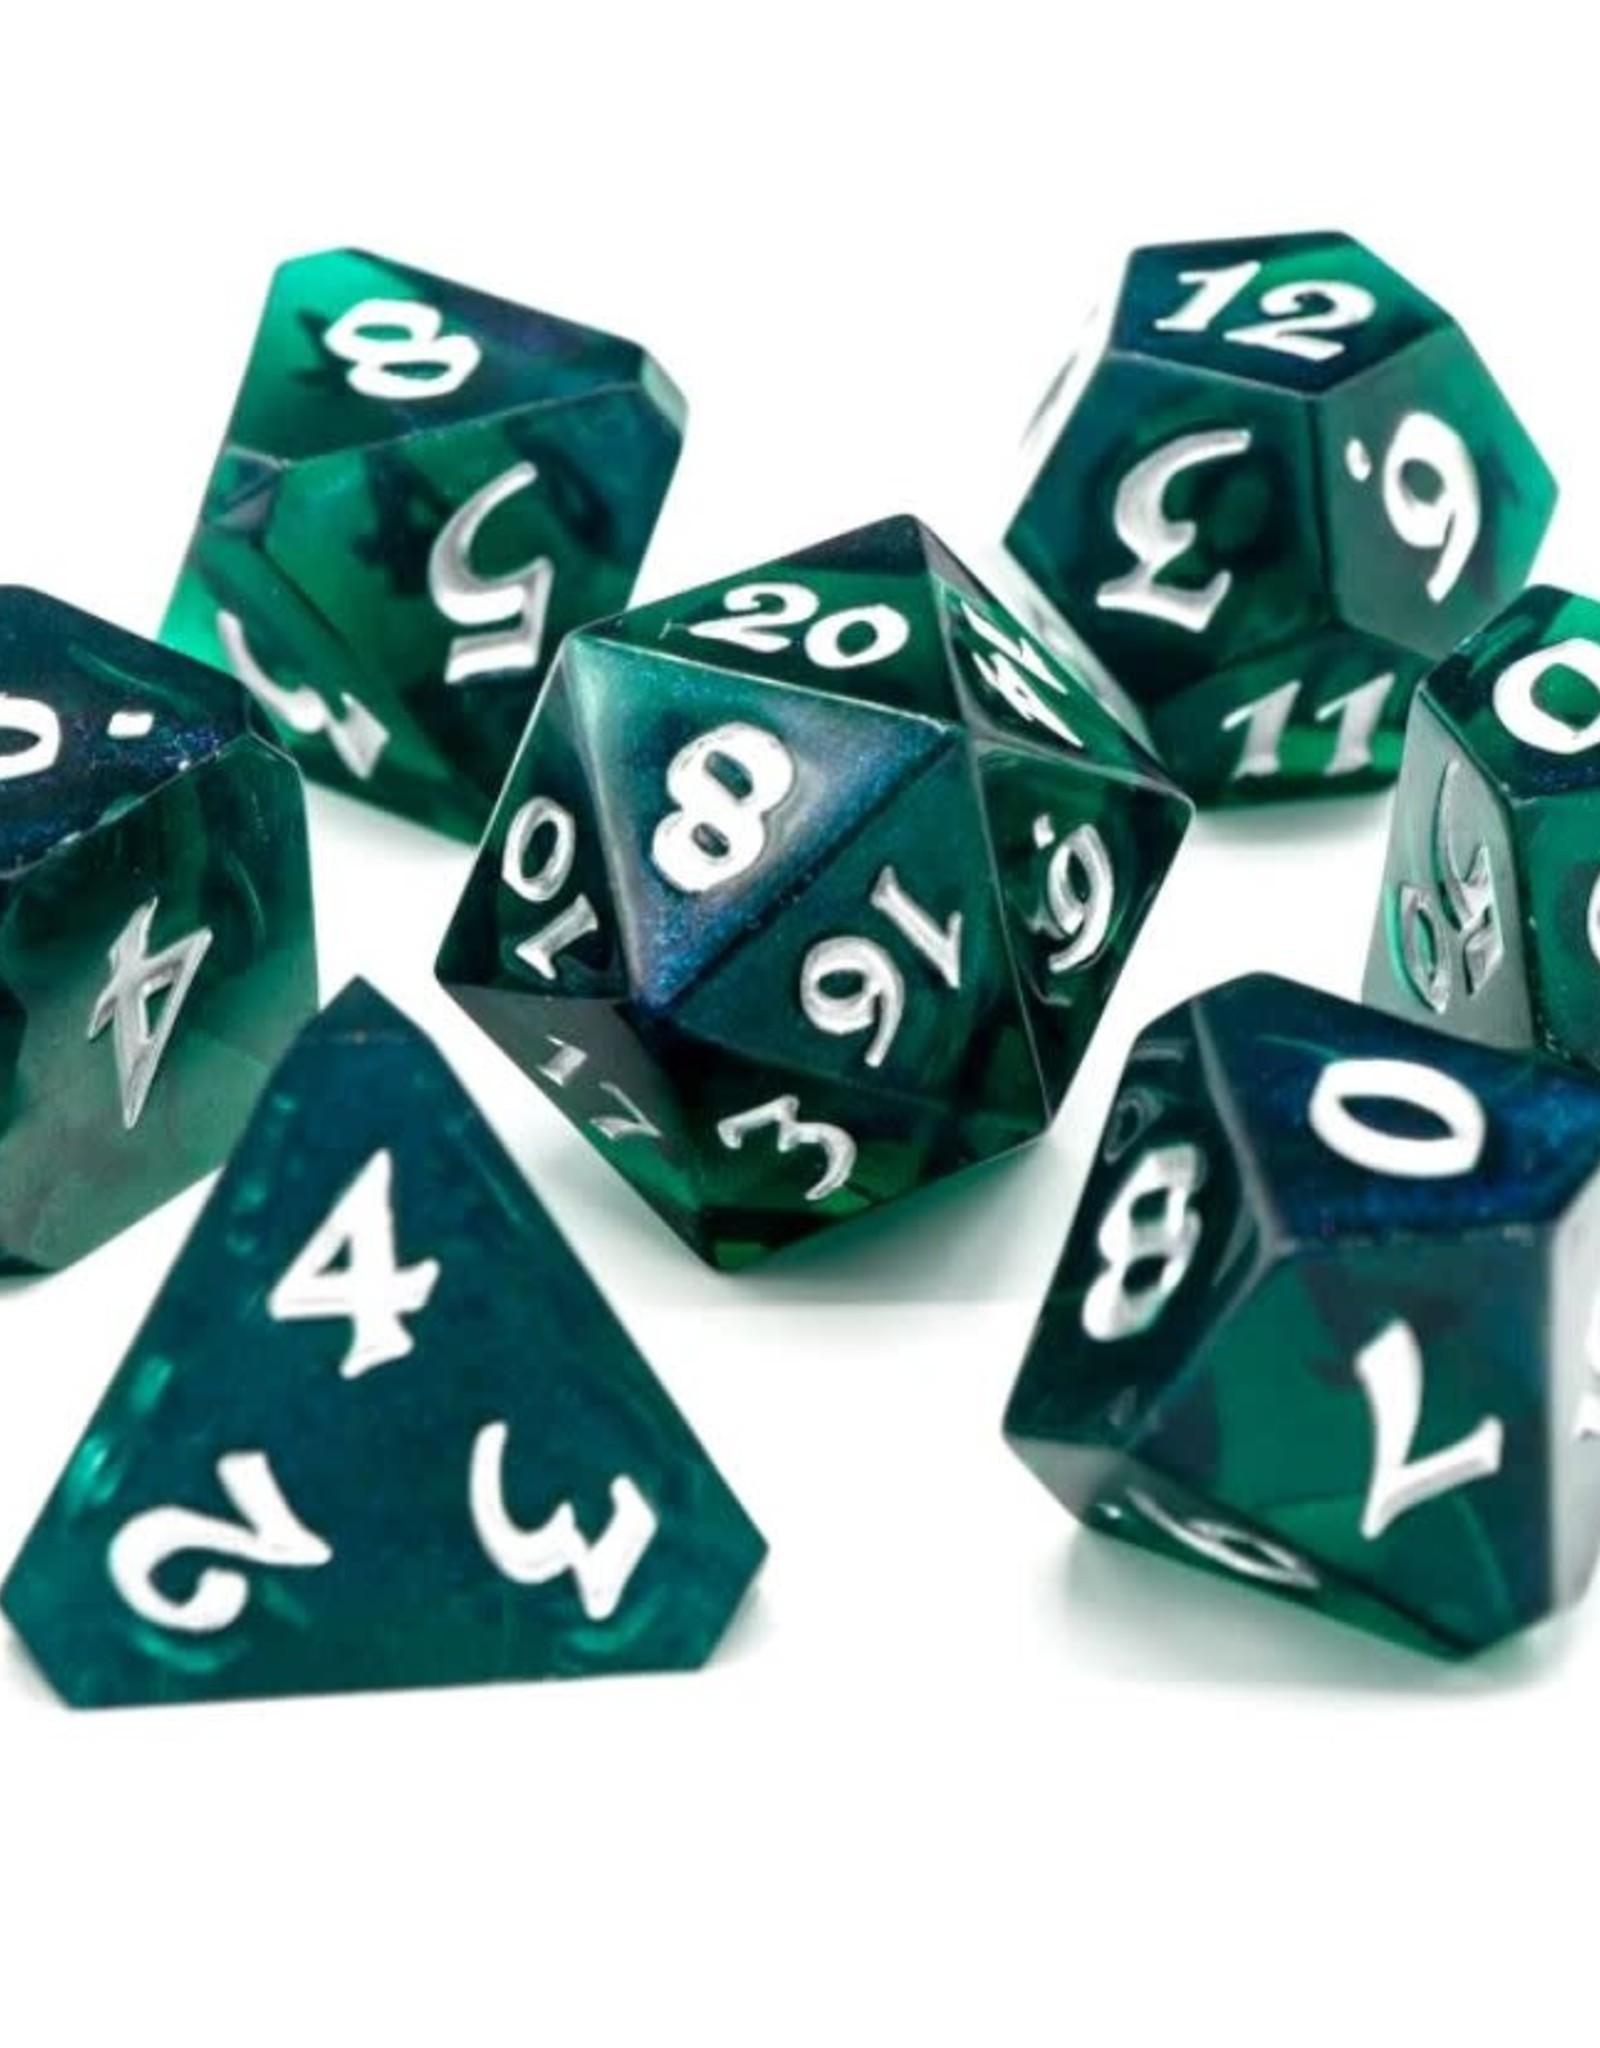 Die Hard Avalore Enchanted Unity Poly 7 Dice Set